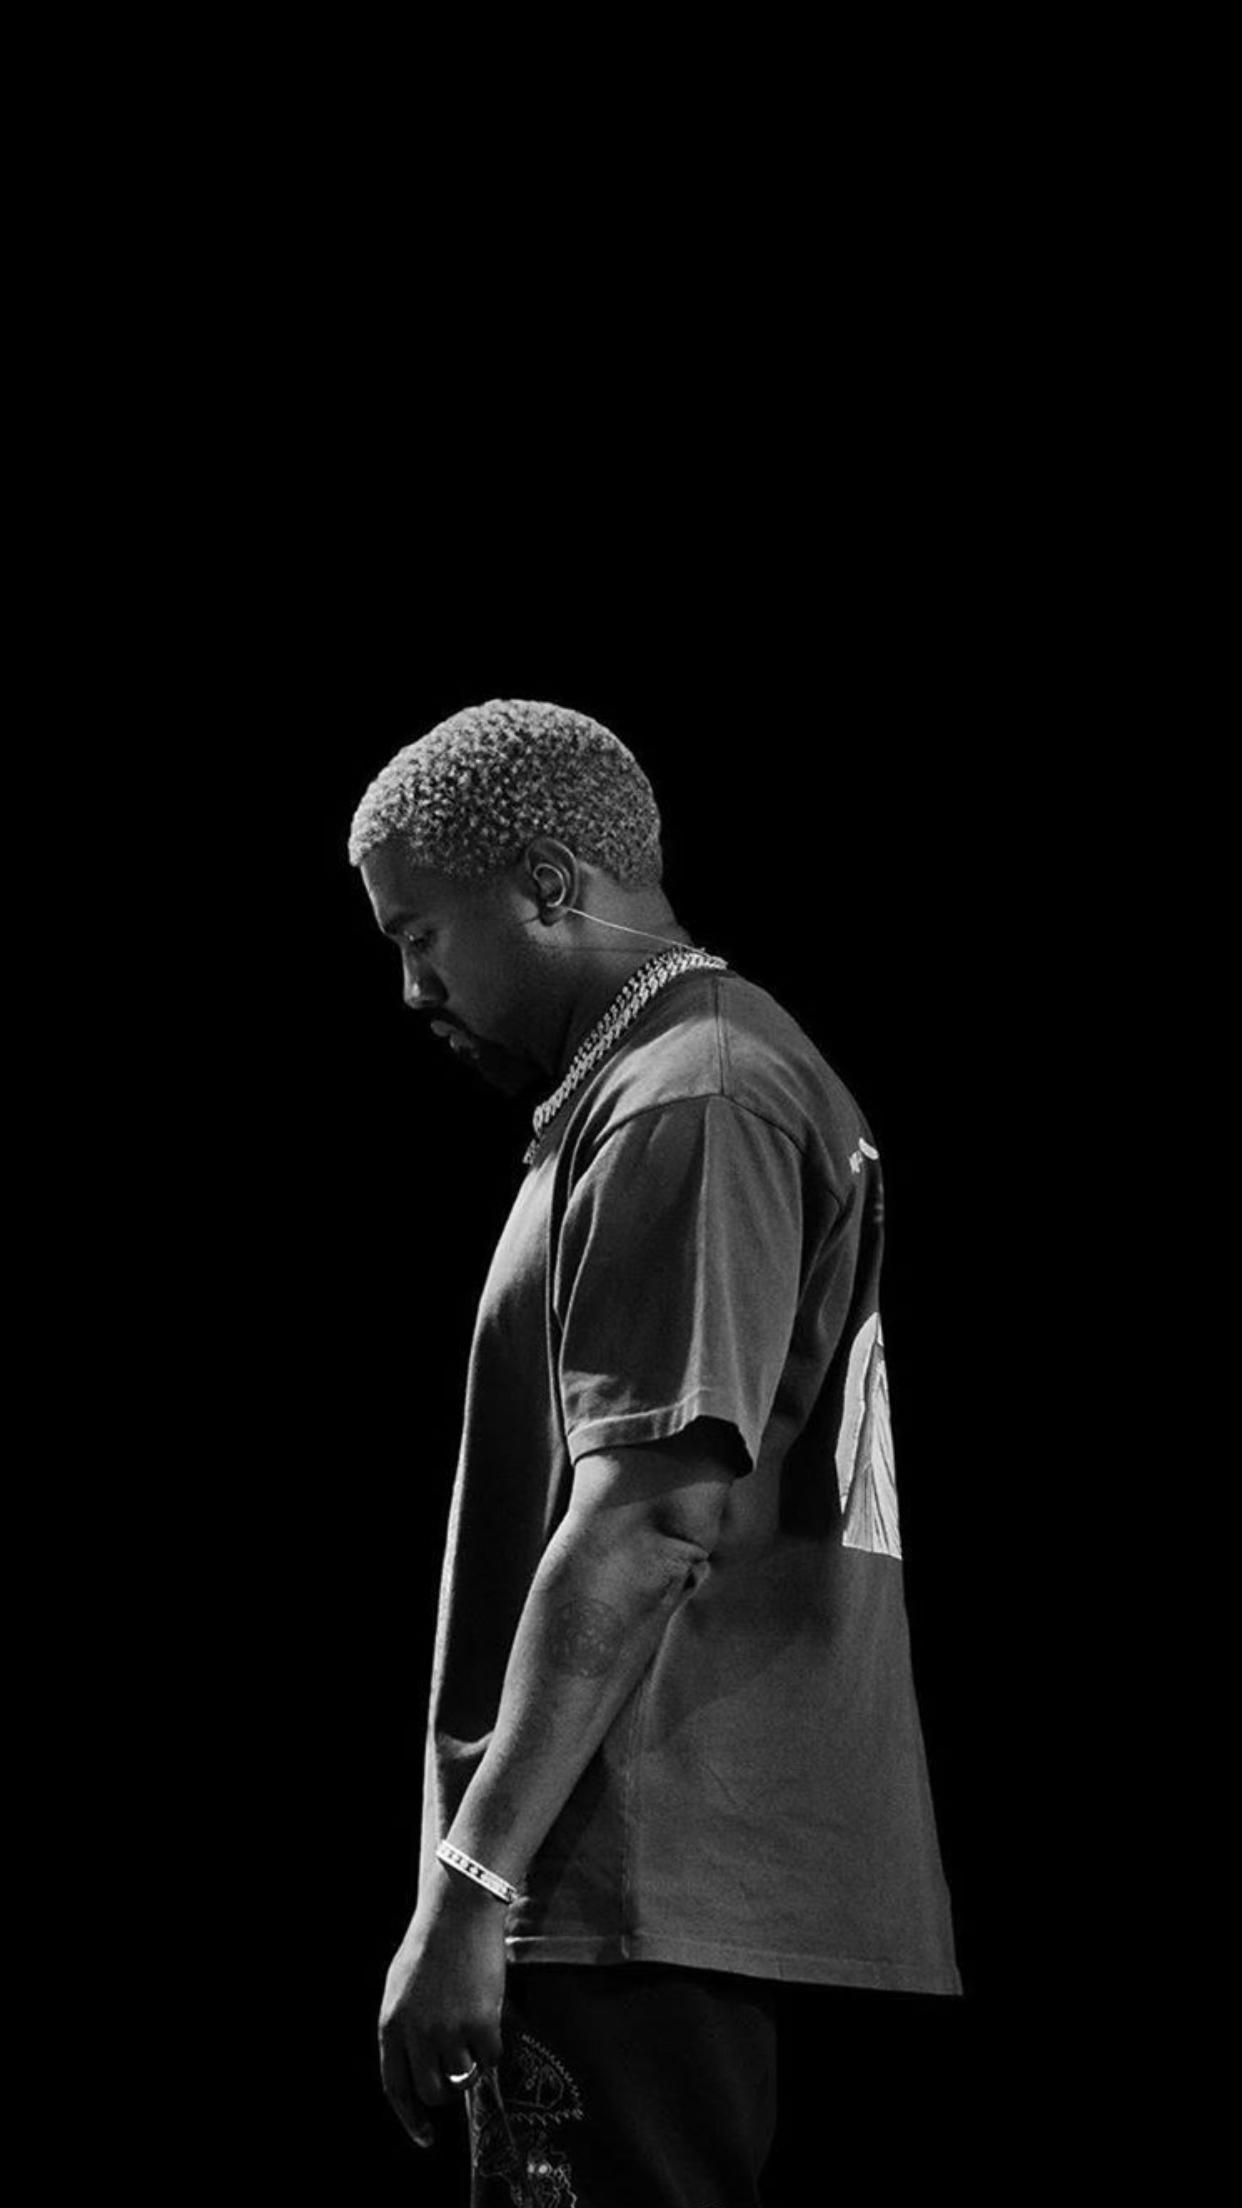 kanye blackandwhite trending pinterest Kanye, Kanye